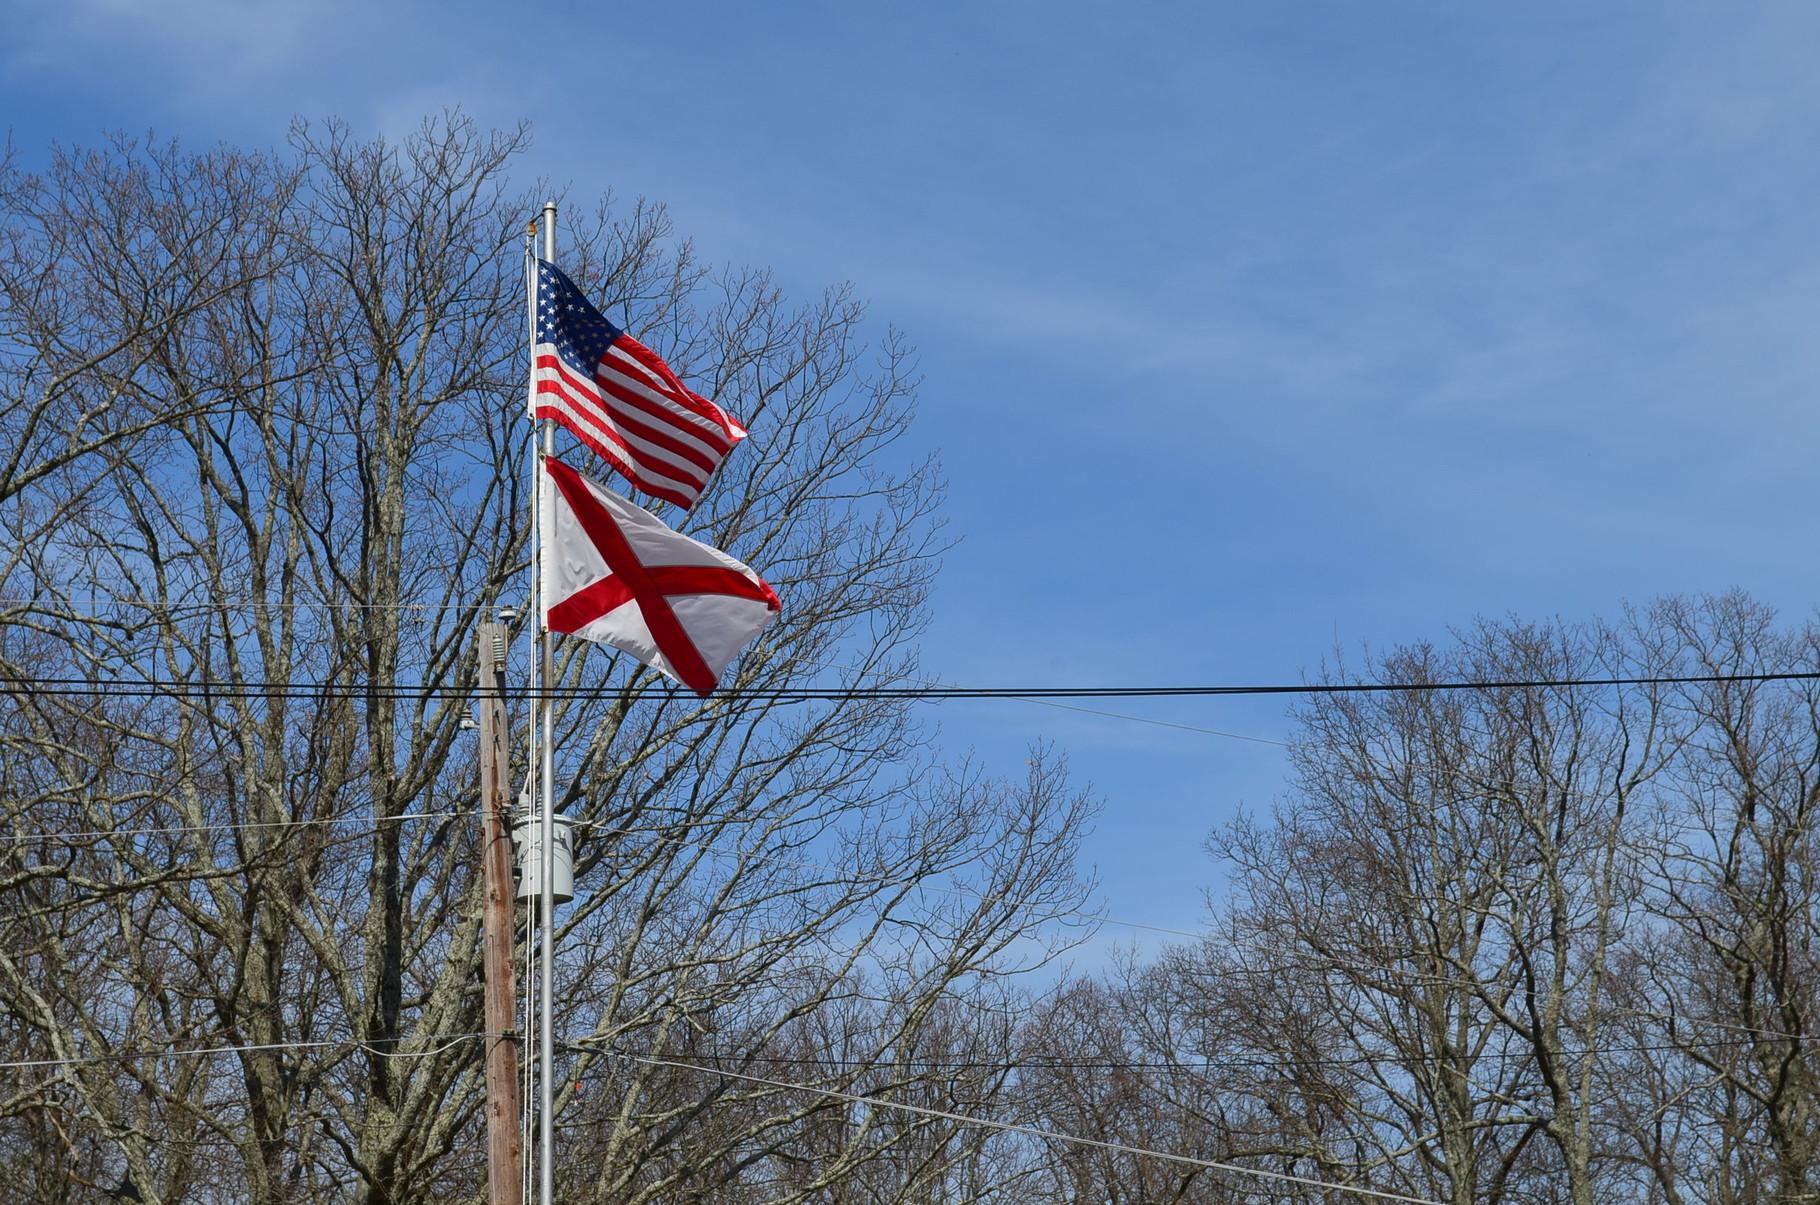 ab jetzt Fotos aus Alabama ☺